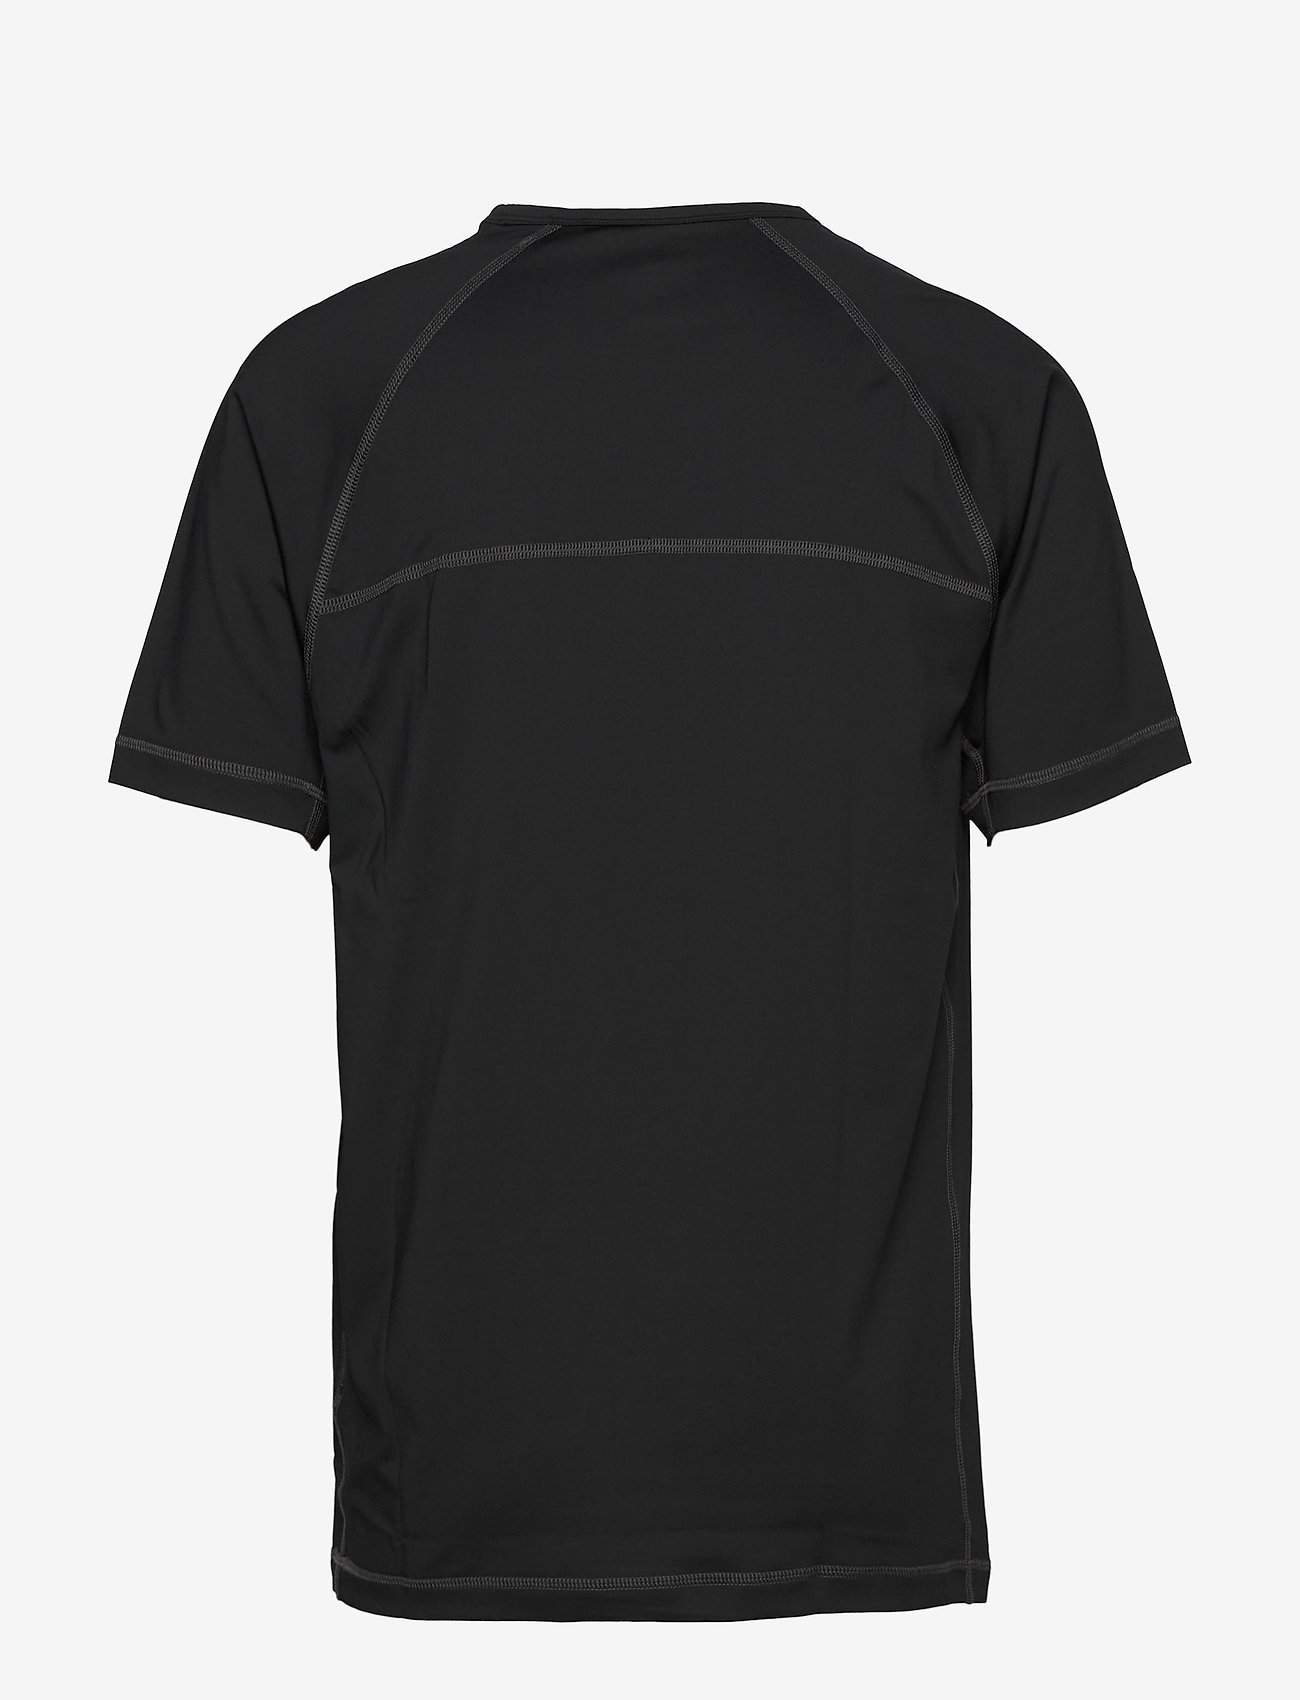 Calvin Klein Performance - SHORT SLEEVE T-SHIRT - t-shirts - ck black/ck black/ck black - 1